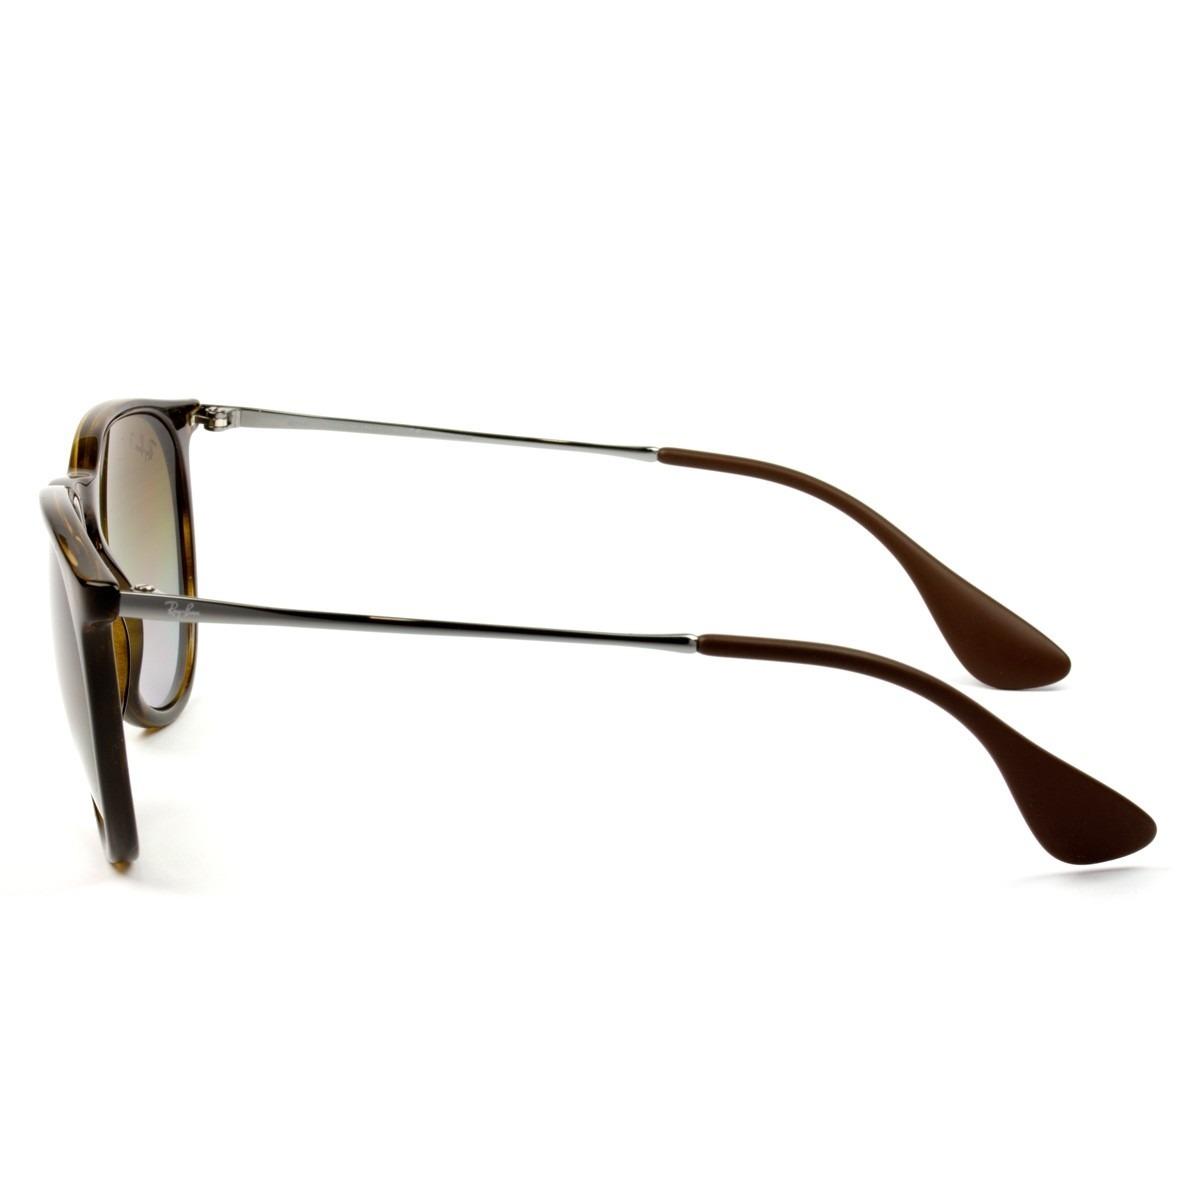 8785c276cc7f8 óculos ray- ban erika rb4171 - tartaruga   polarizado. Carregando zoom.